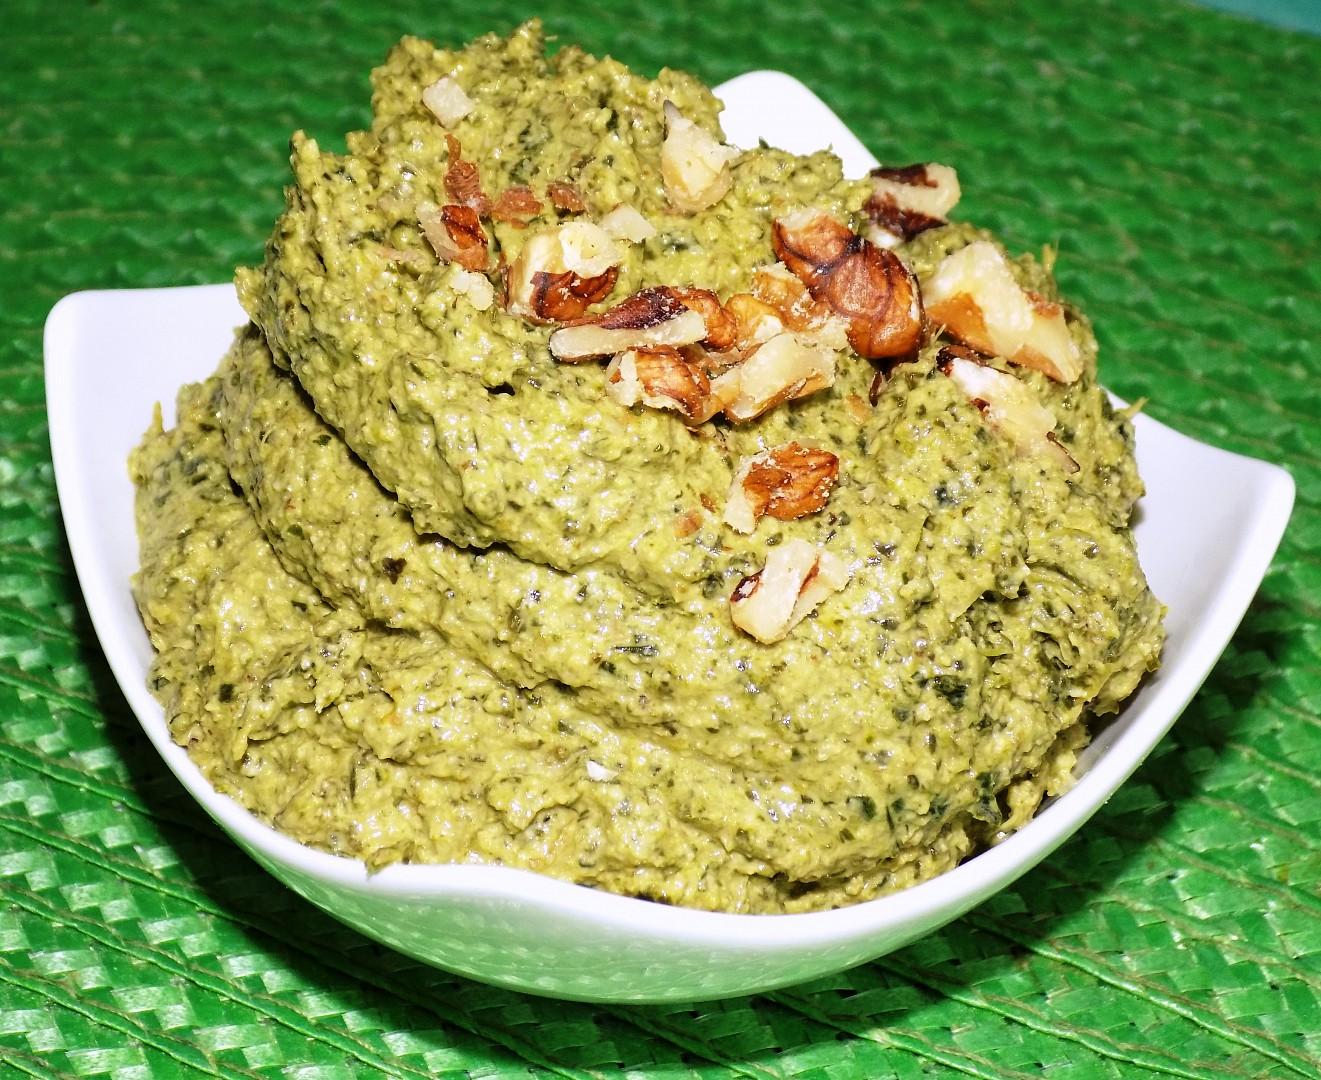 Pesto z kadeřávku s vlašskými ořechy recept